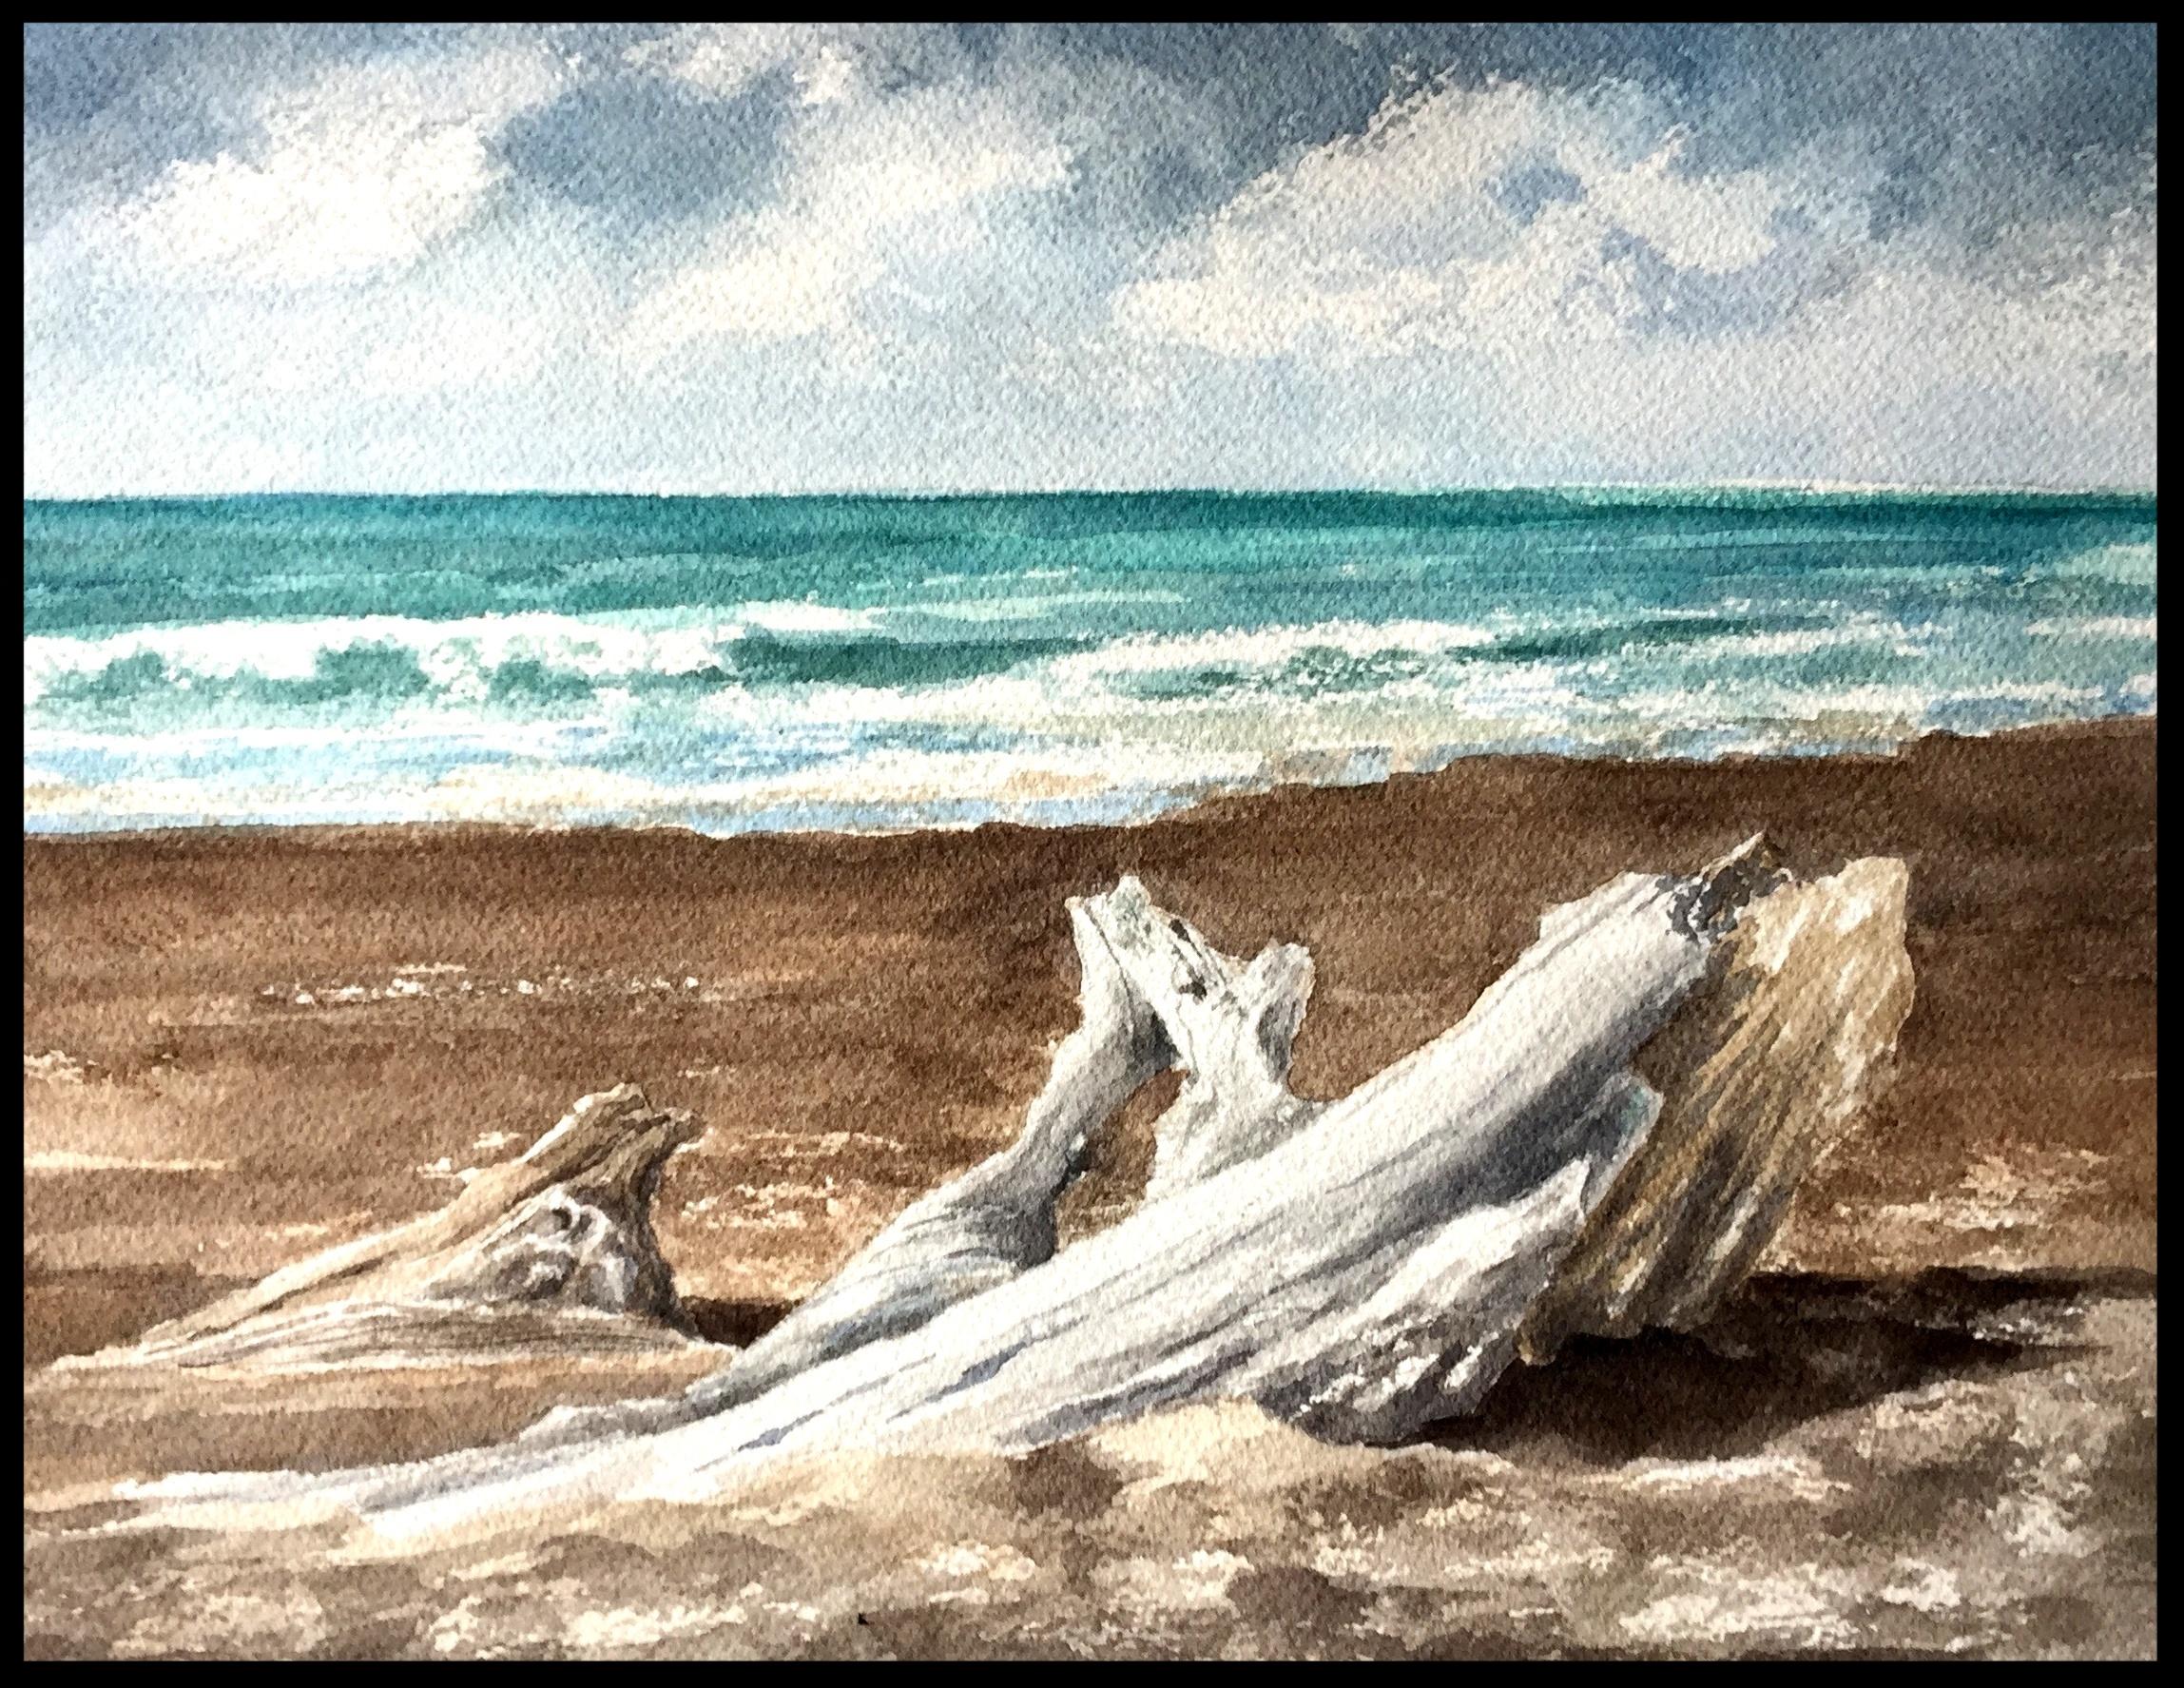 MOONSTONE BEACH DRIFTWOOD